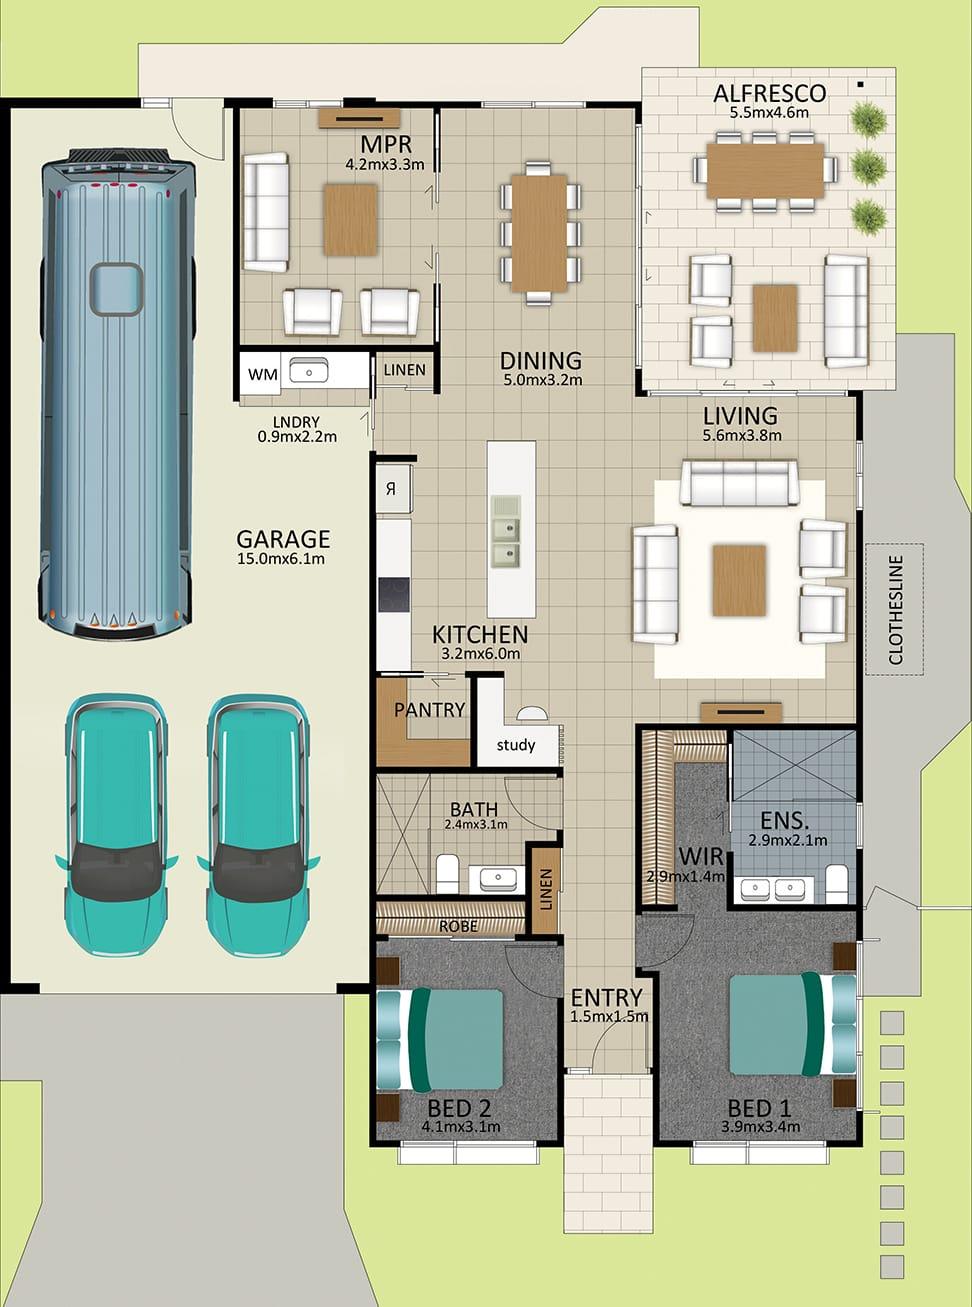 LR WEB LAT25 Floorplan LOT 167 Pepper JUL19 V2 - Lot 167